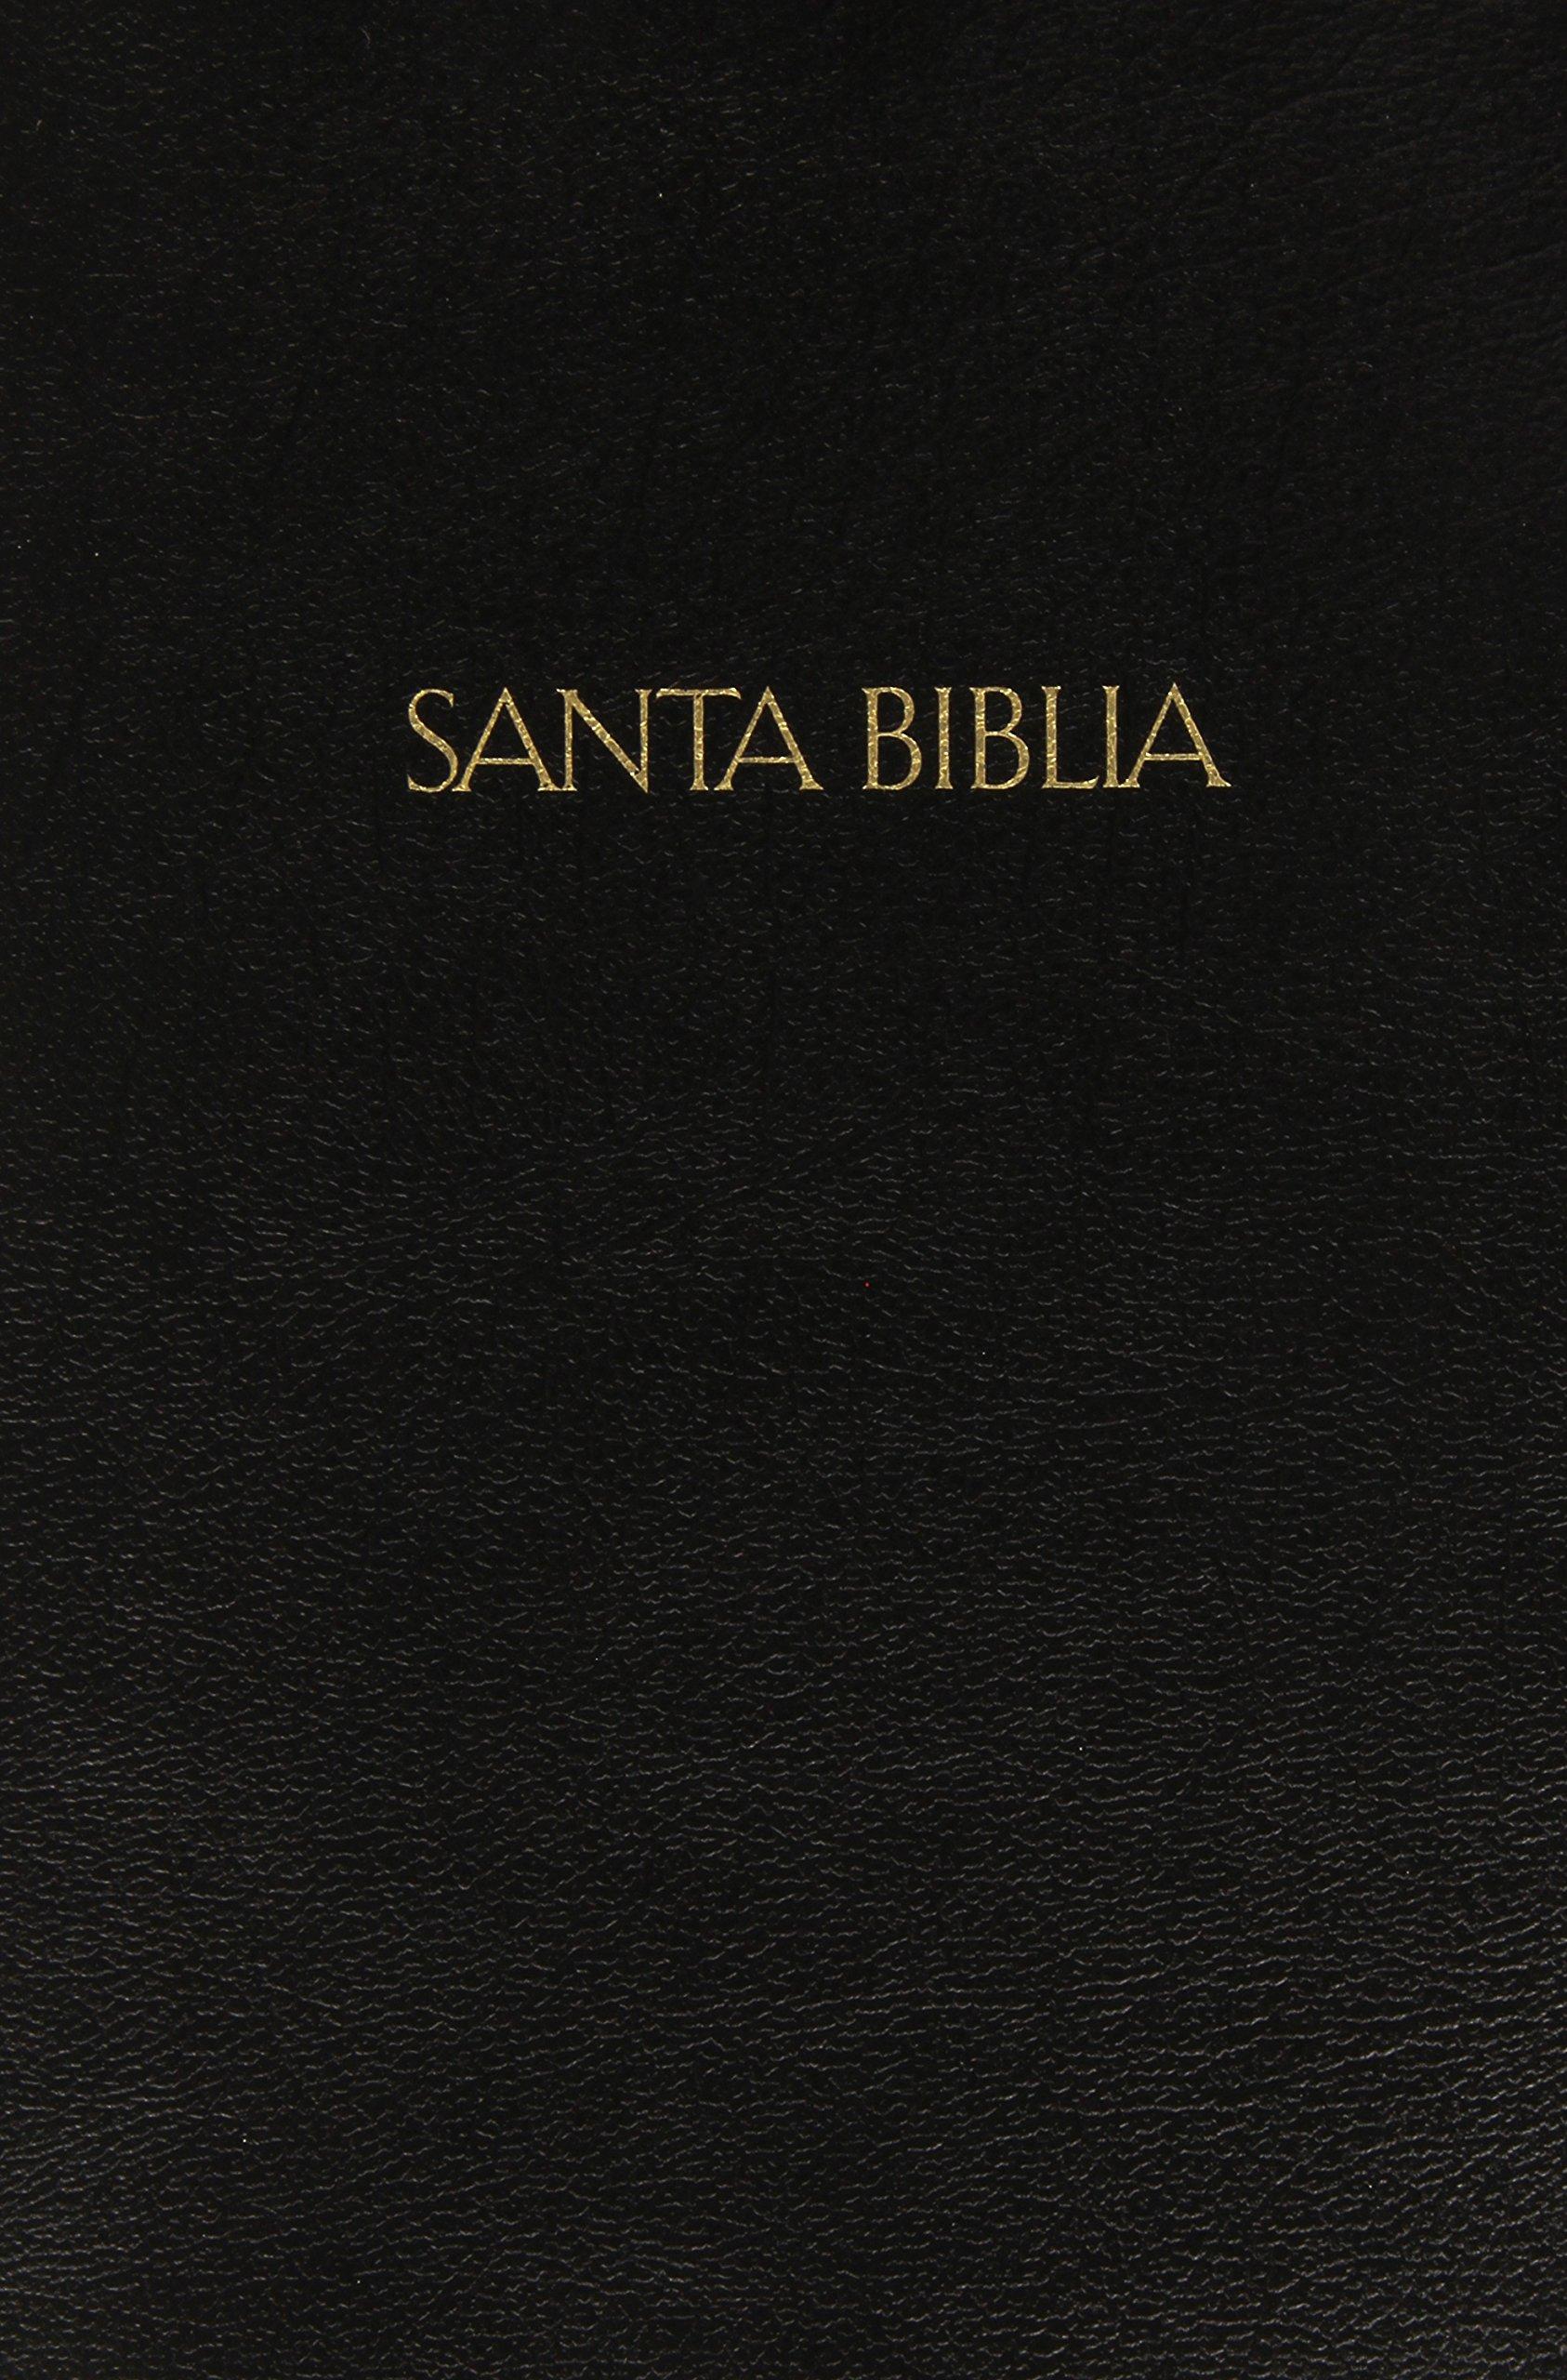 Santa Biblia  (Spanish And English) (Spanish and English Edition) by B & H Publishing Group